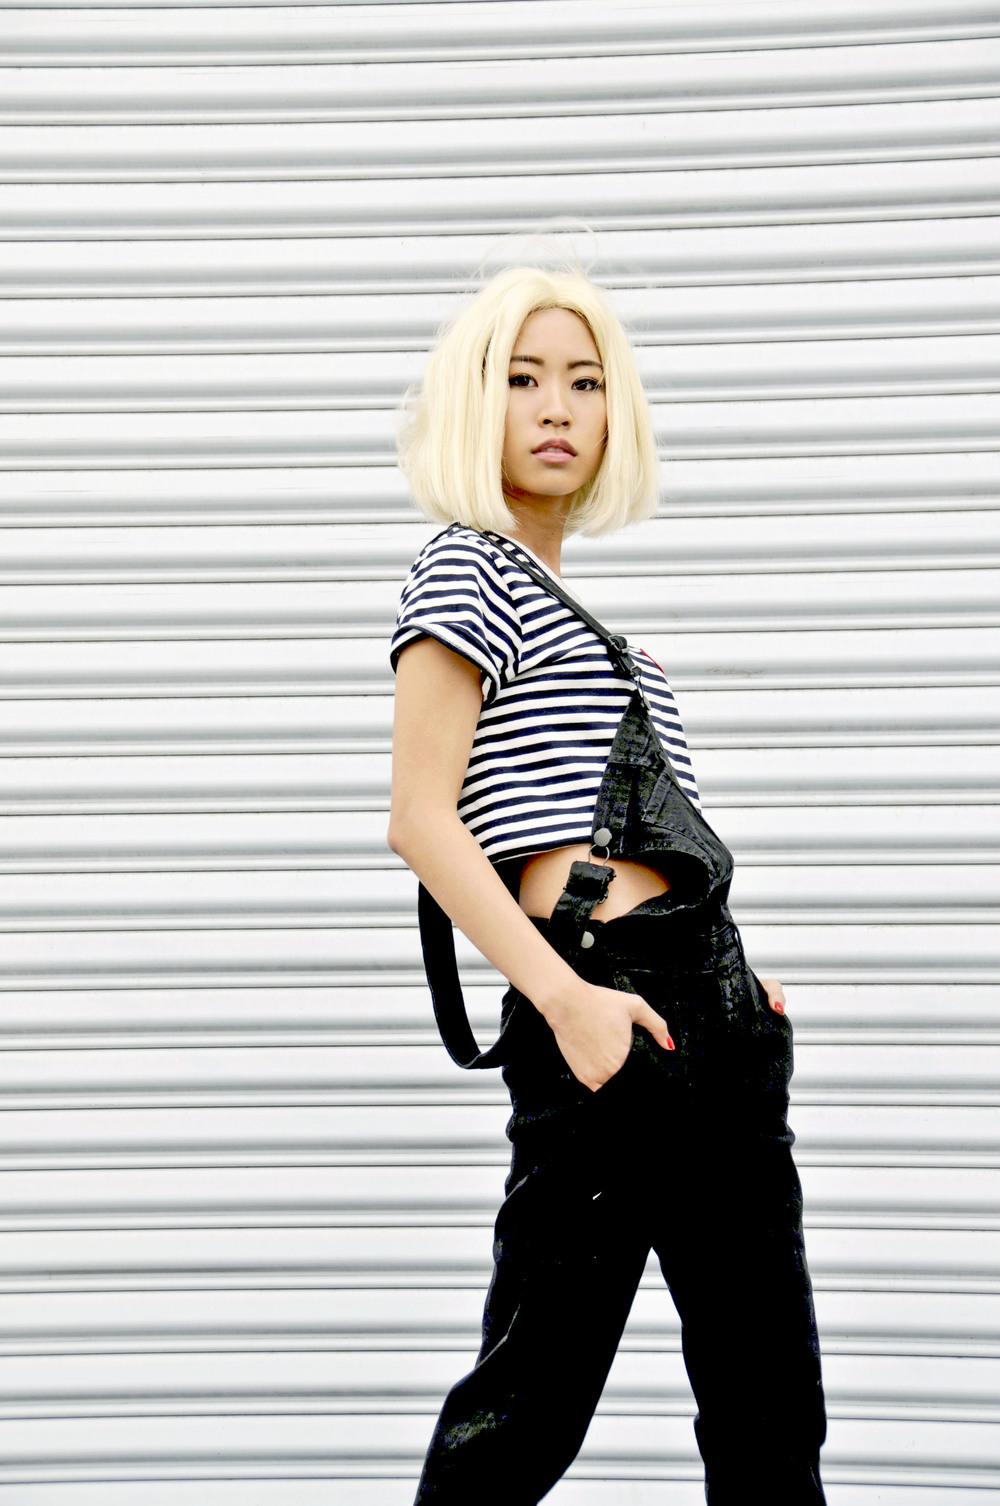 Blonde_Overalls_4